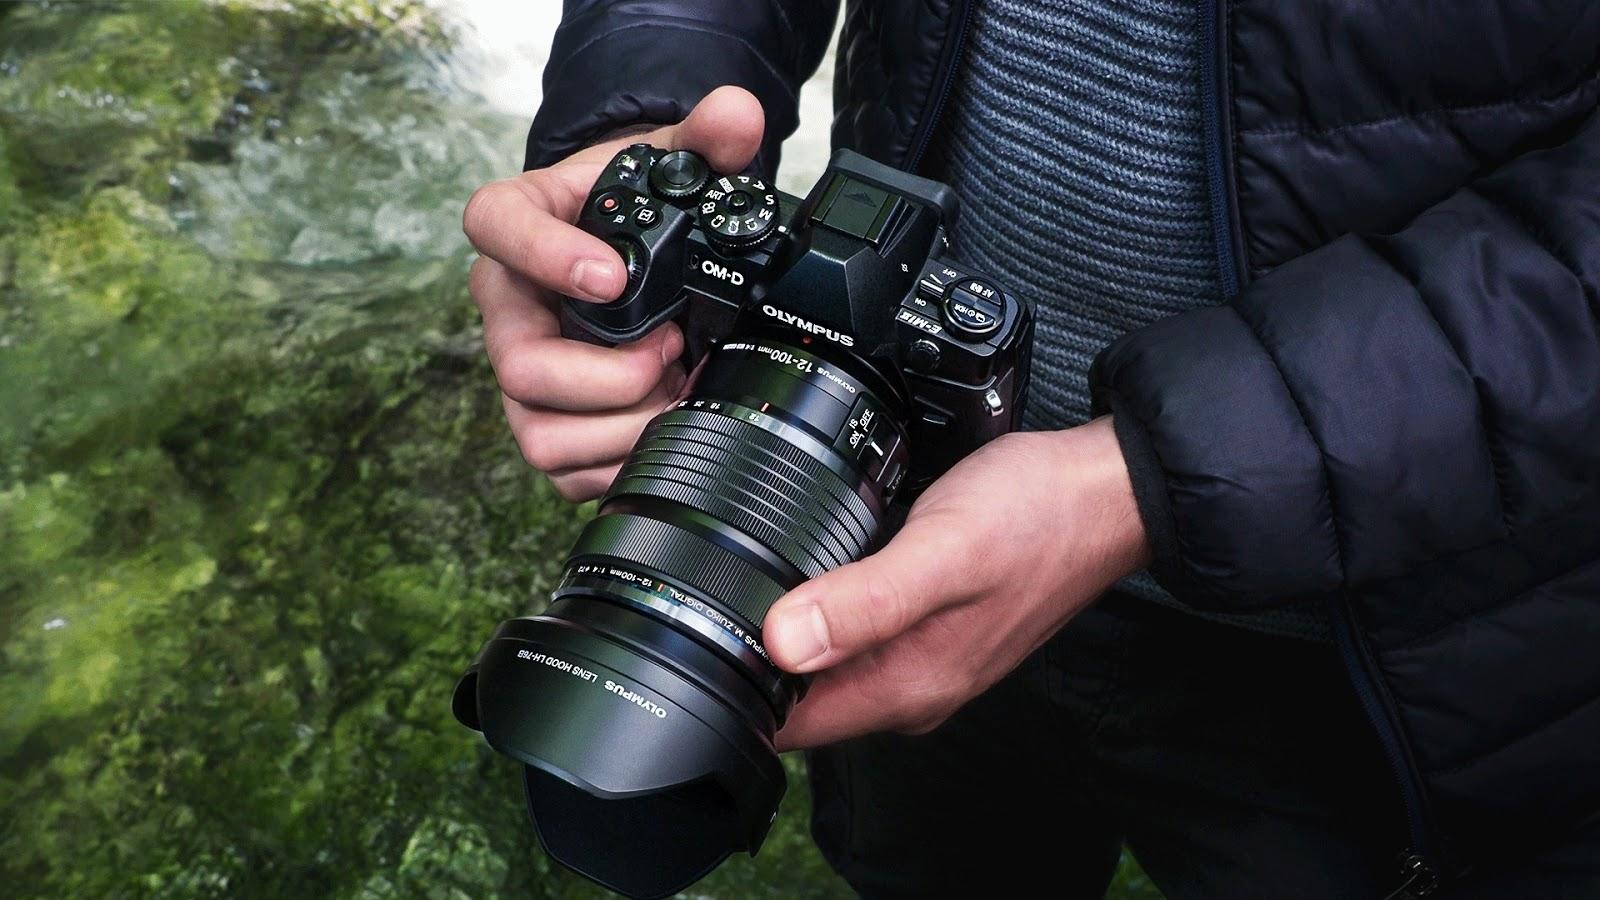 Park Cameras Blog: New firmware upgrades for Olympus OM-D E-M1 Mark